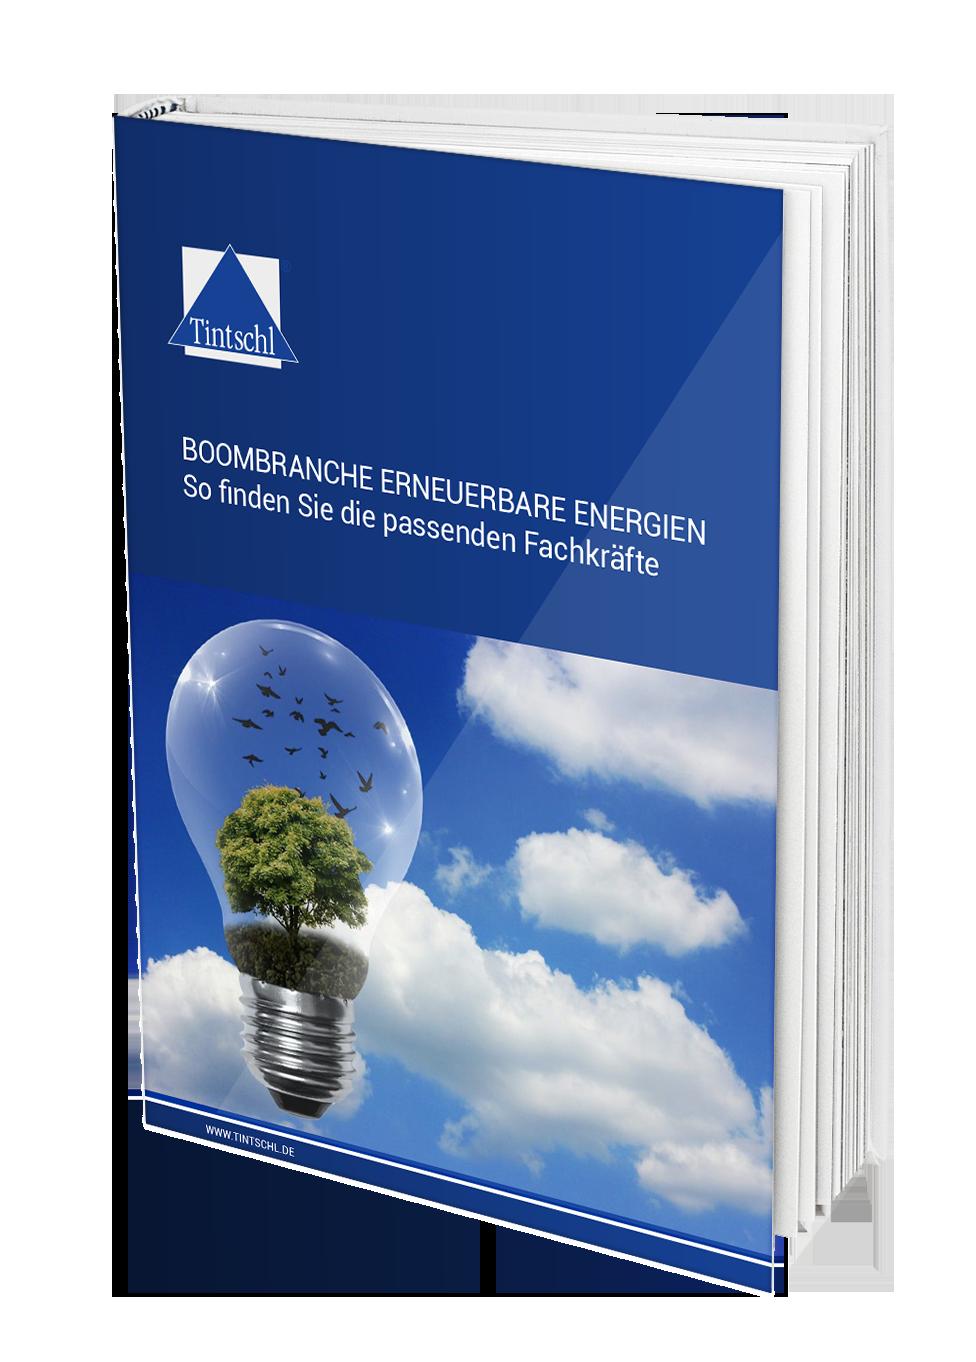 Boombranche Erneuerbare Energien